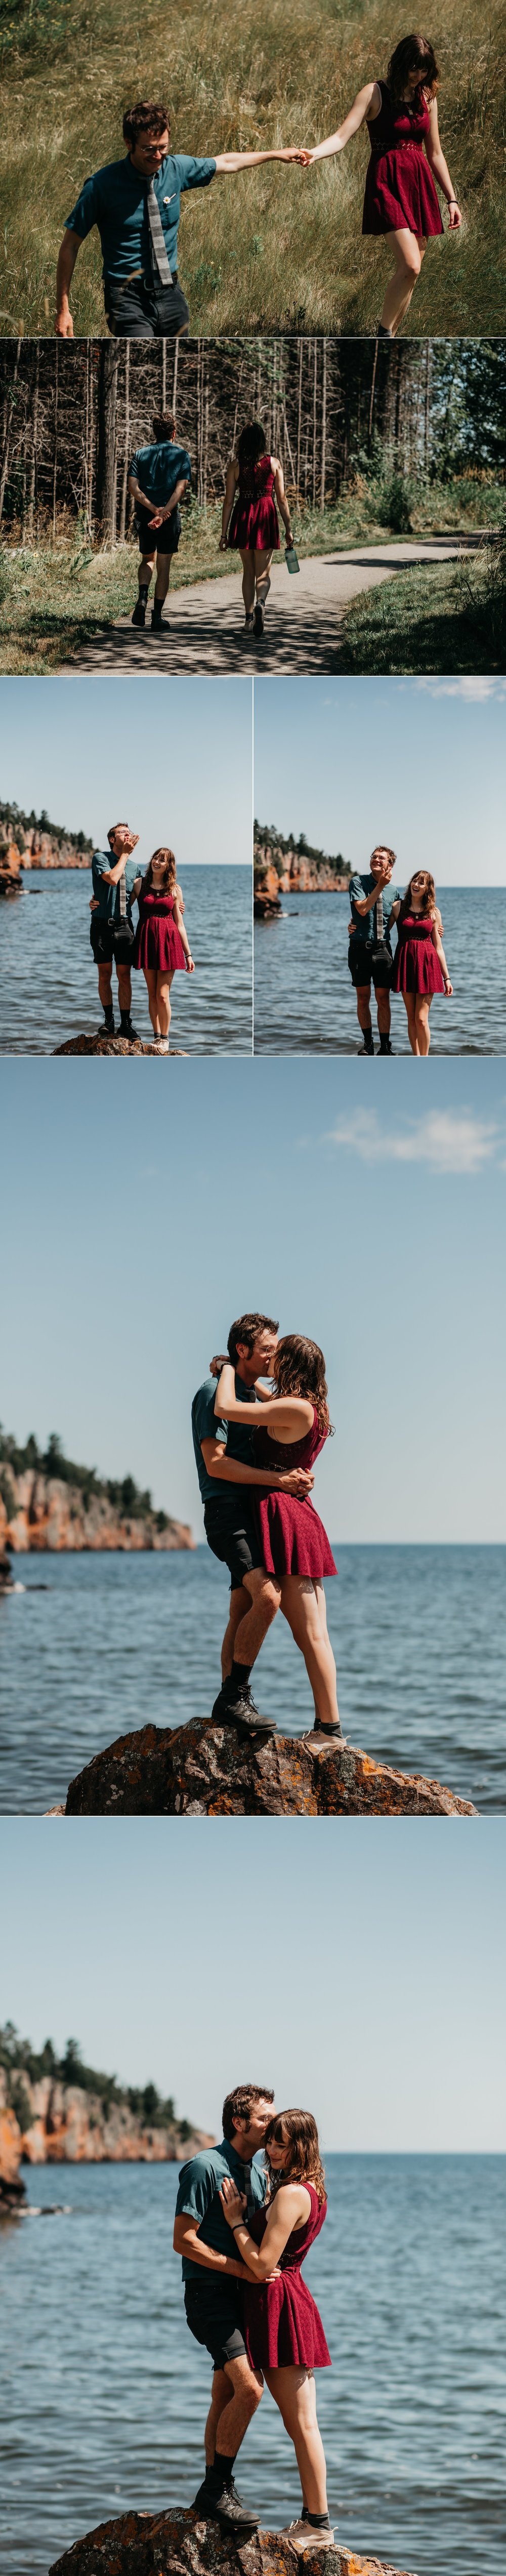 mandy aaron engagement minneapolis minnesota texas austin wedding elopement destination intimate best photographer_0177.jpg